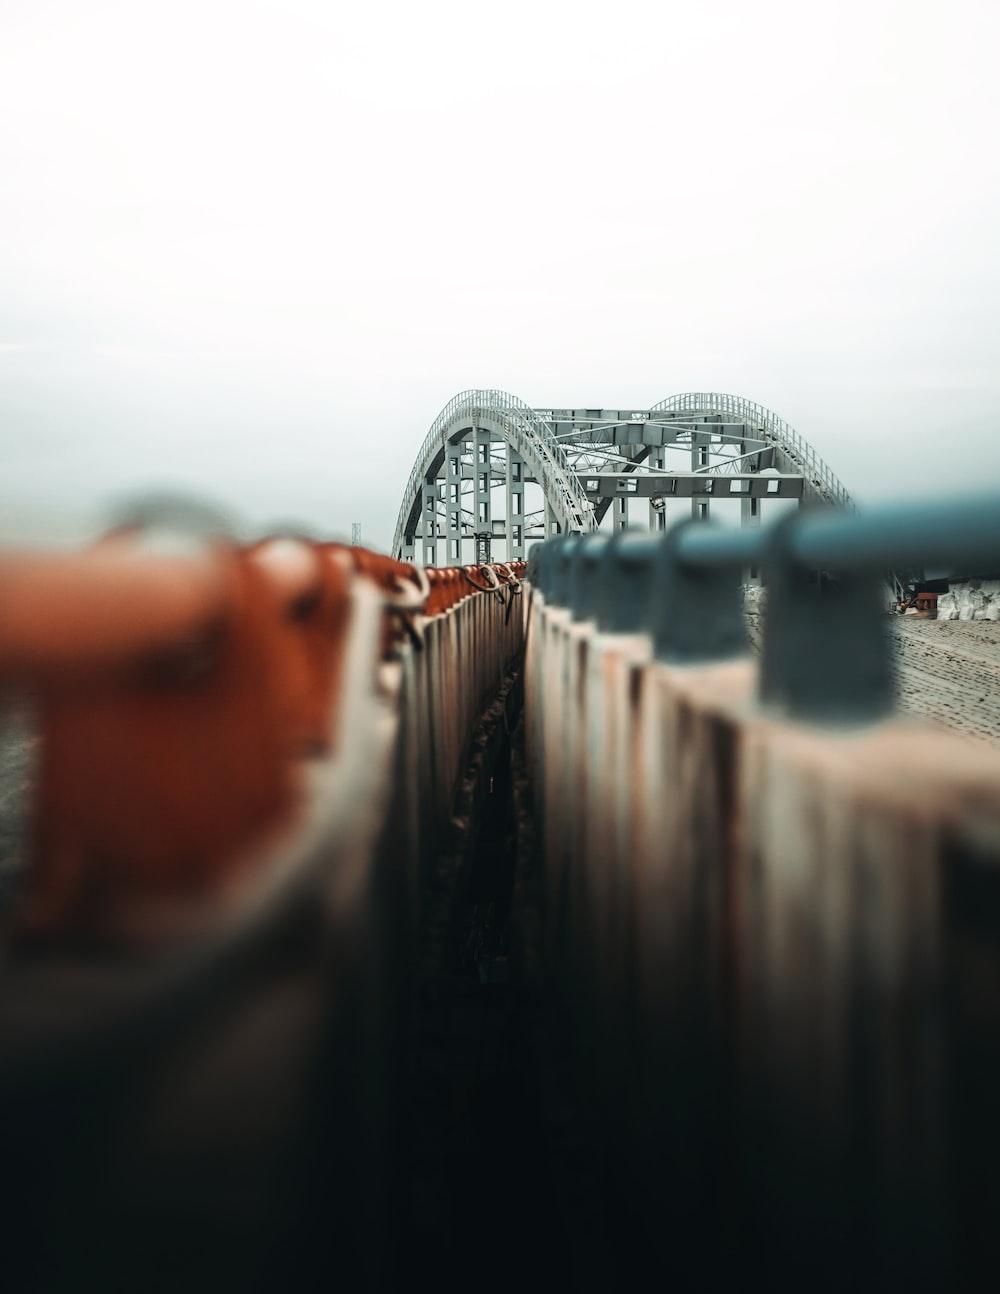 gray steel bridge over body of water during daytime